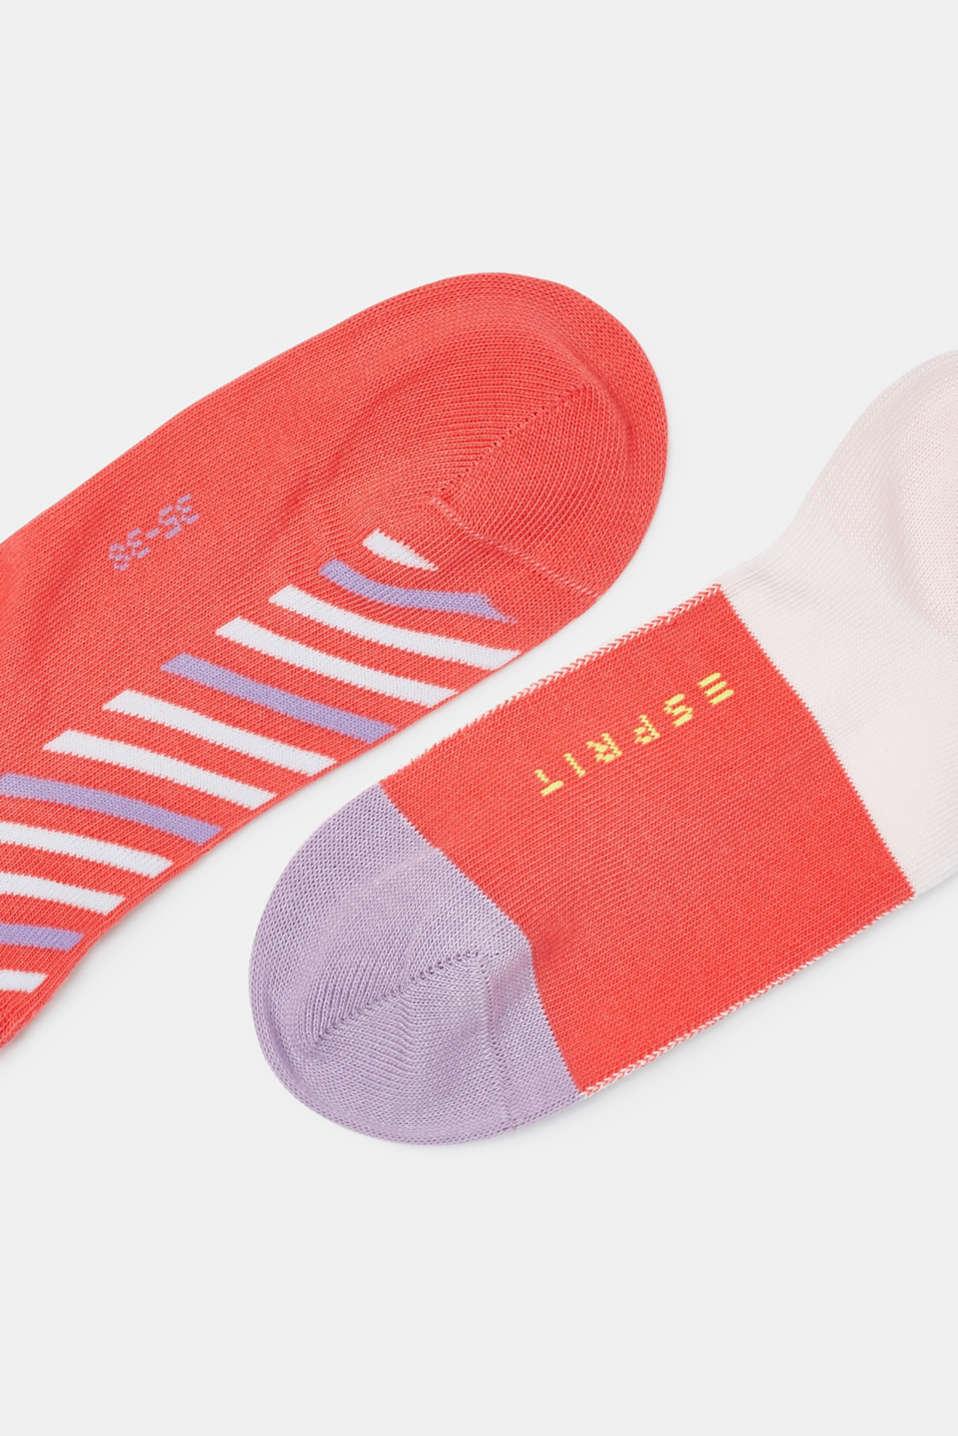 3-pack of blended cotton trainer socks, CORAL, detail image number 1